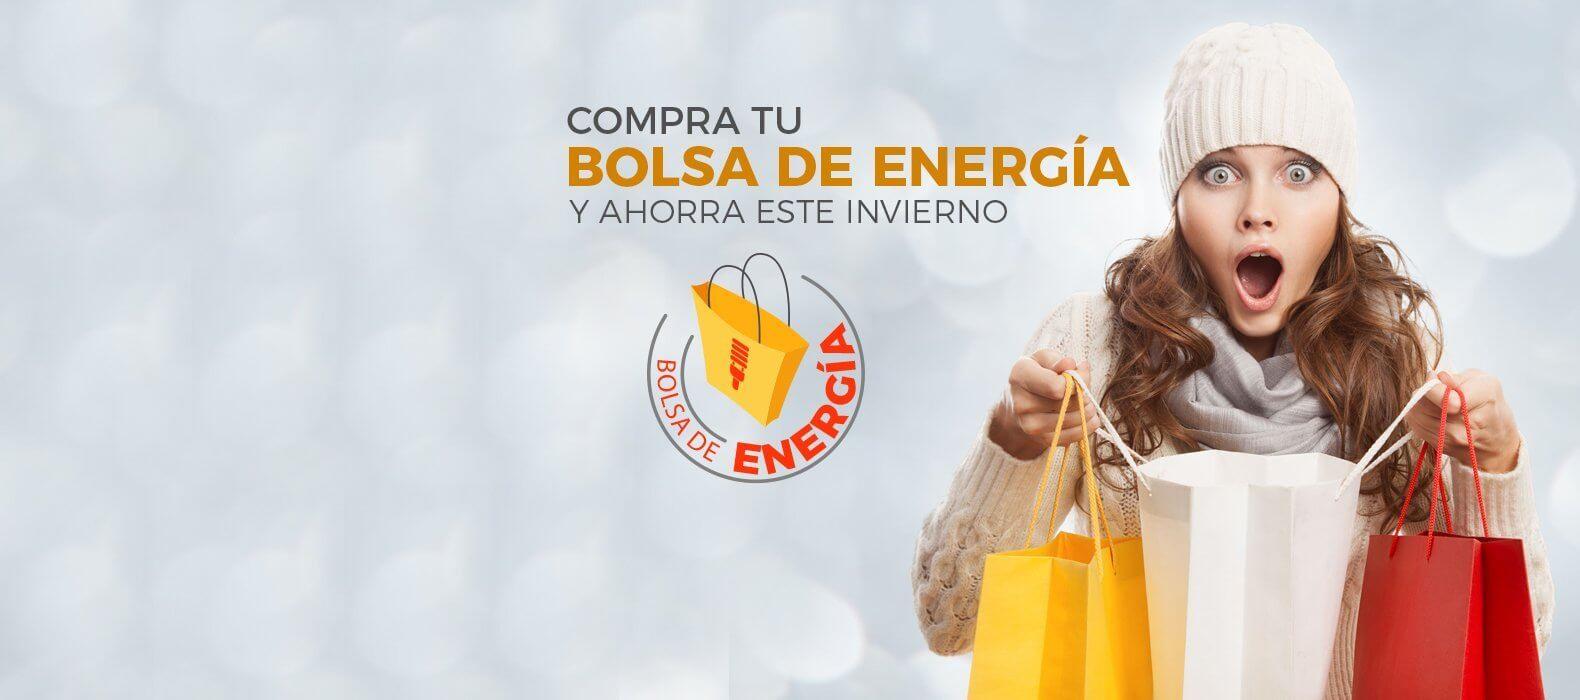 Bolsa de energía